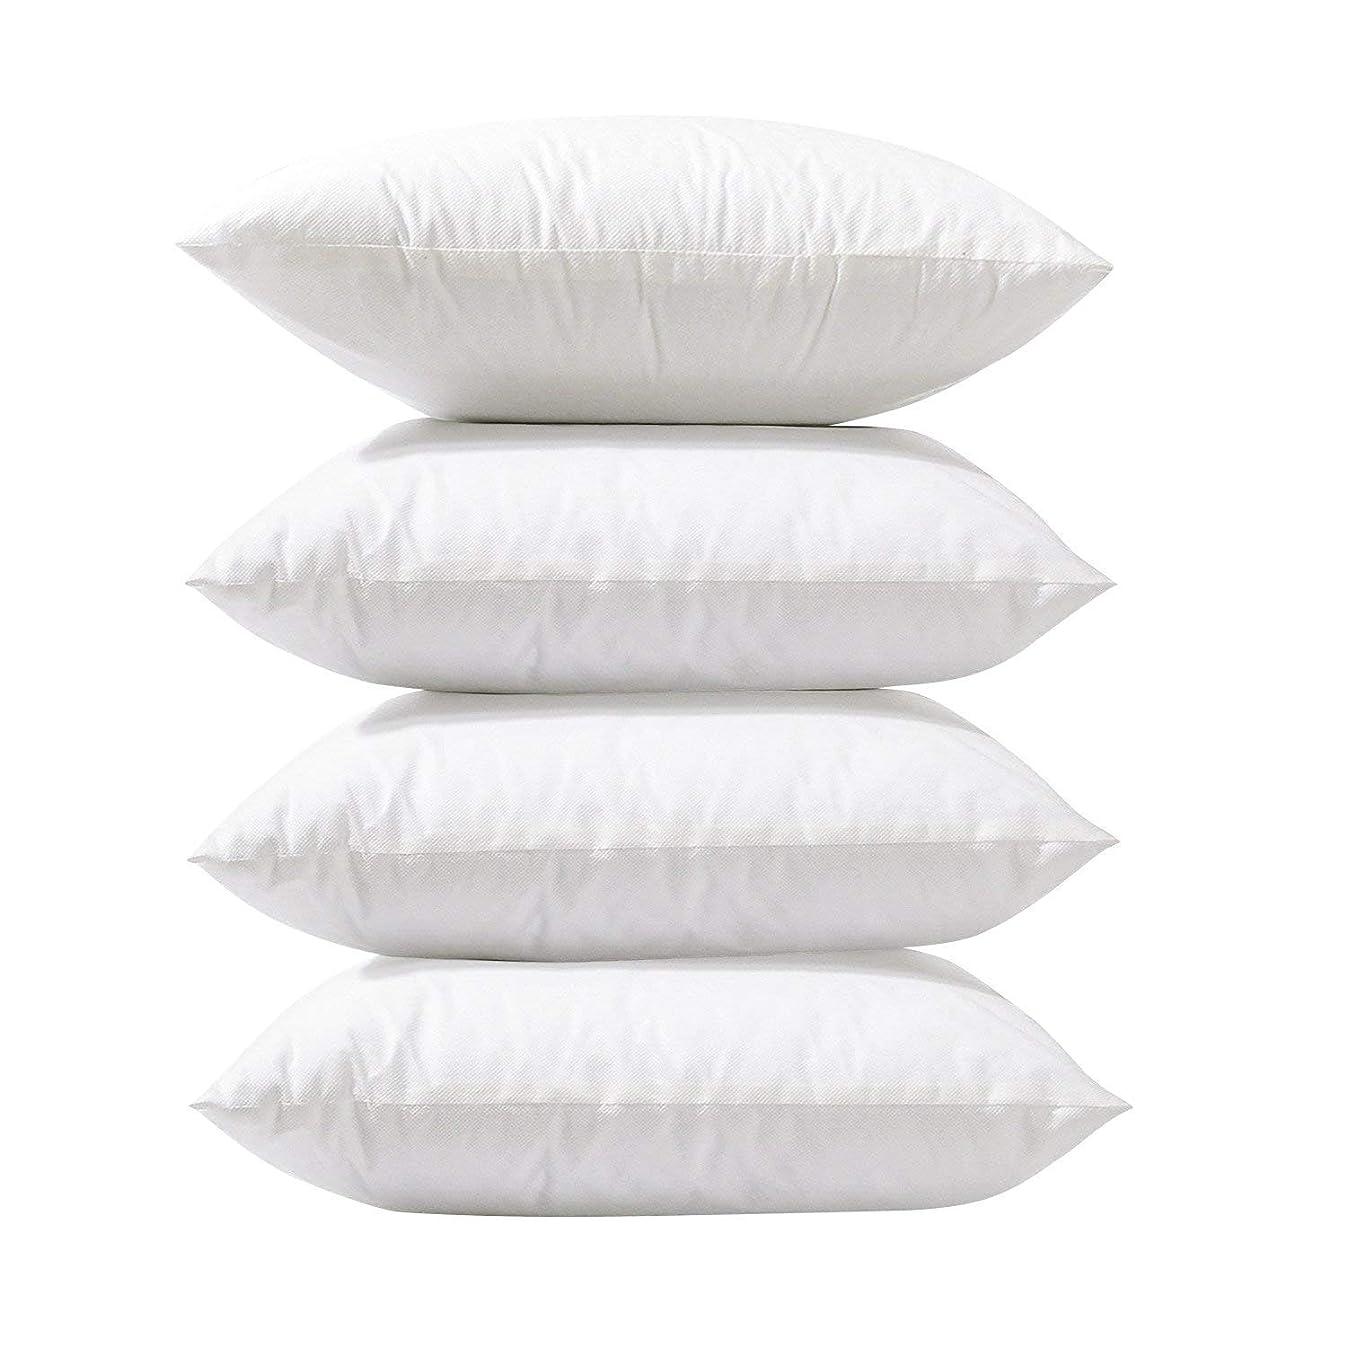 Phantoscope 4 Packs Throw Pillow Inserts Hypoallergenic Square Form Sham Stuffer 18